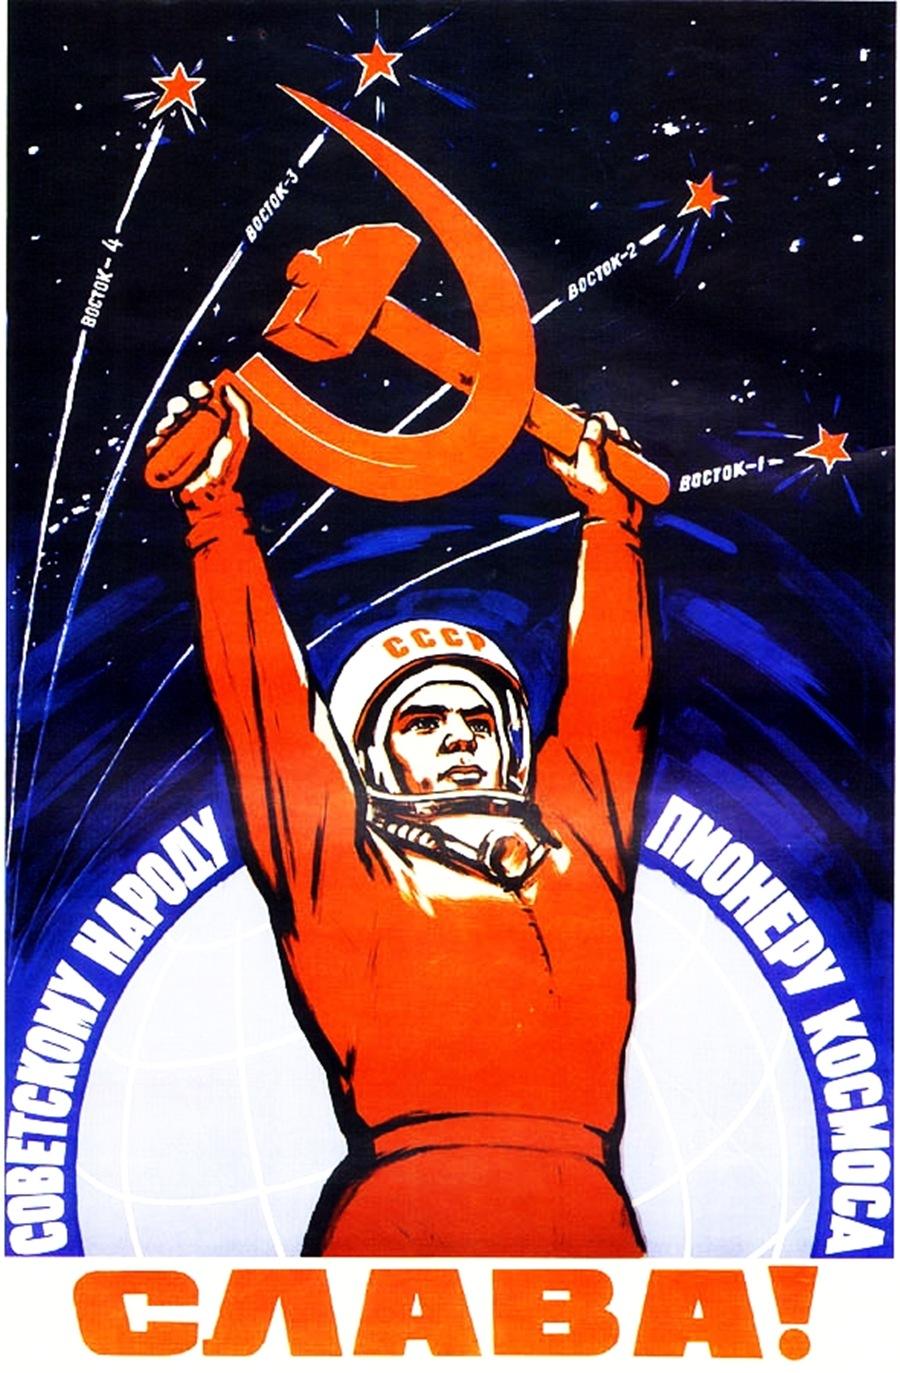 Картинки по запросу социализм картинки открытки